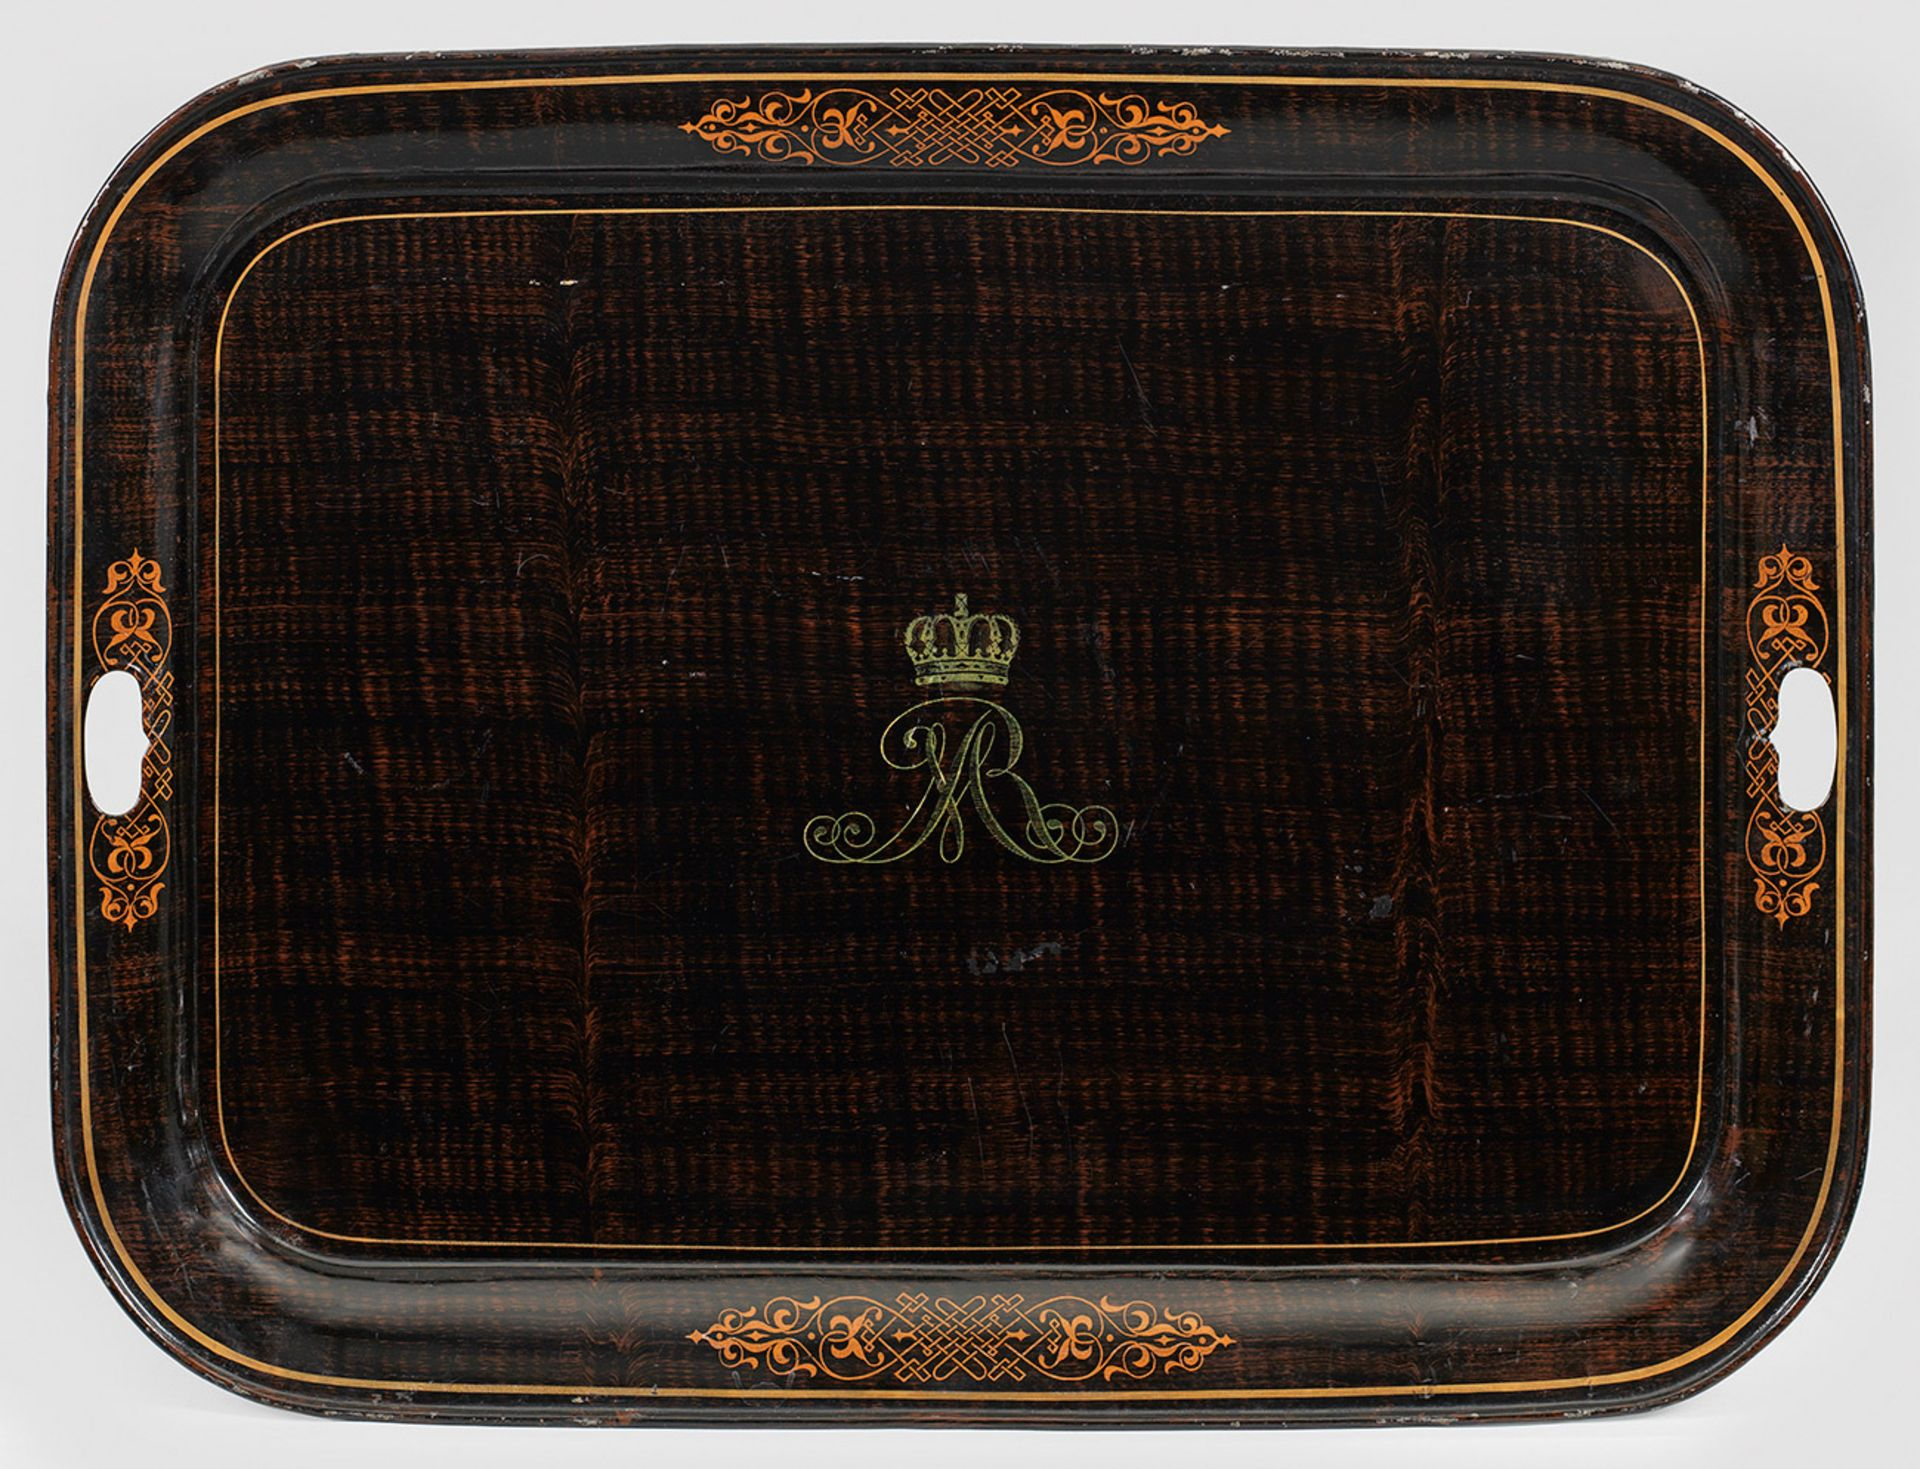 Königliches Tablett des Hauses Hannover